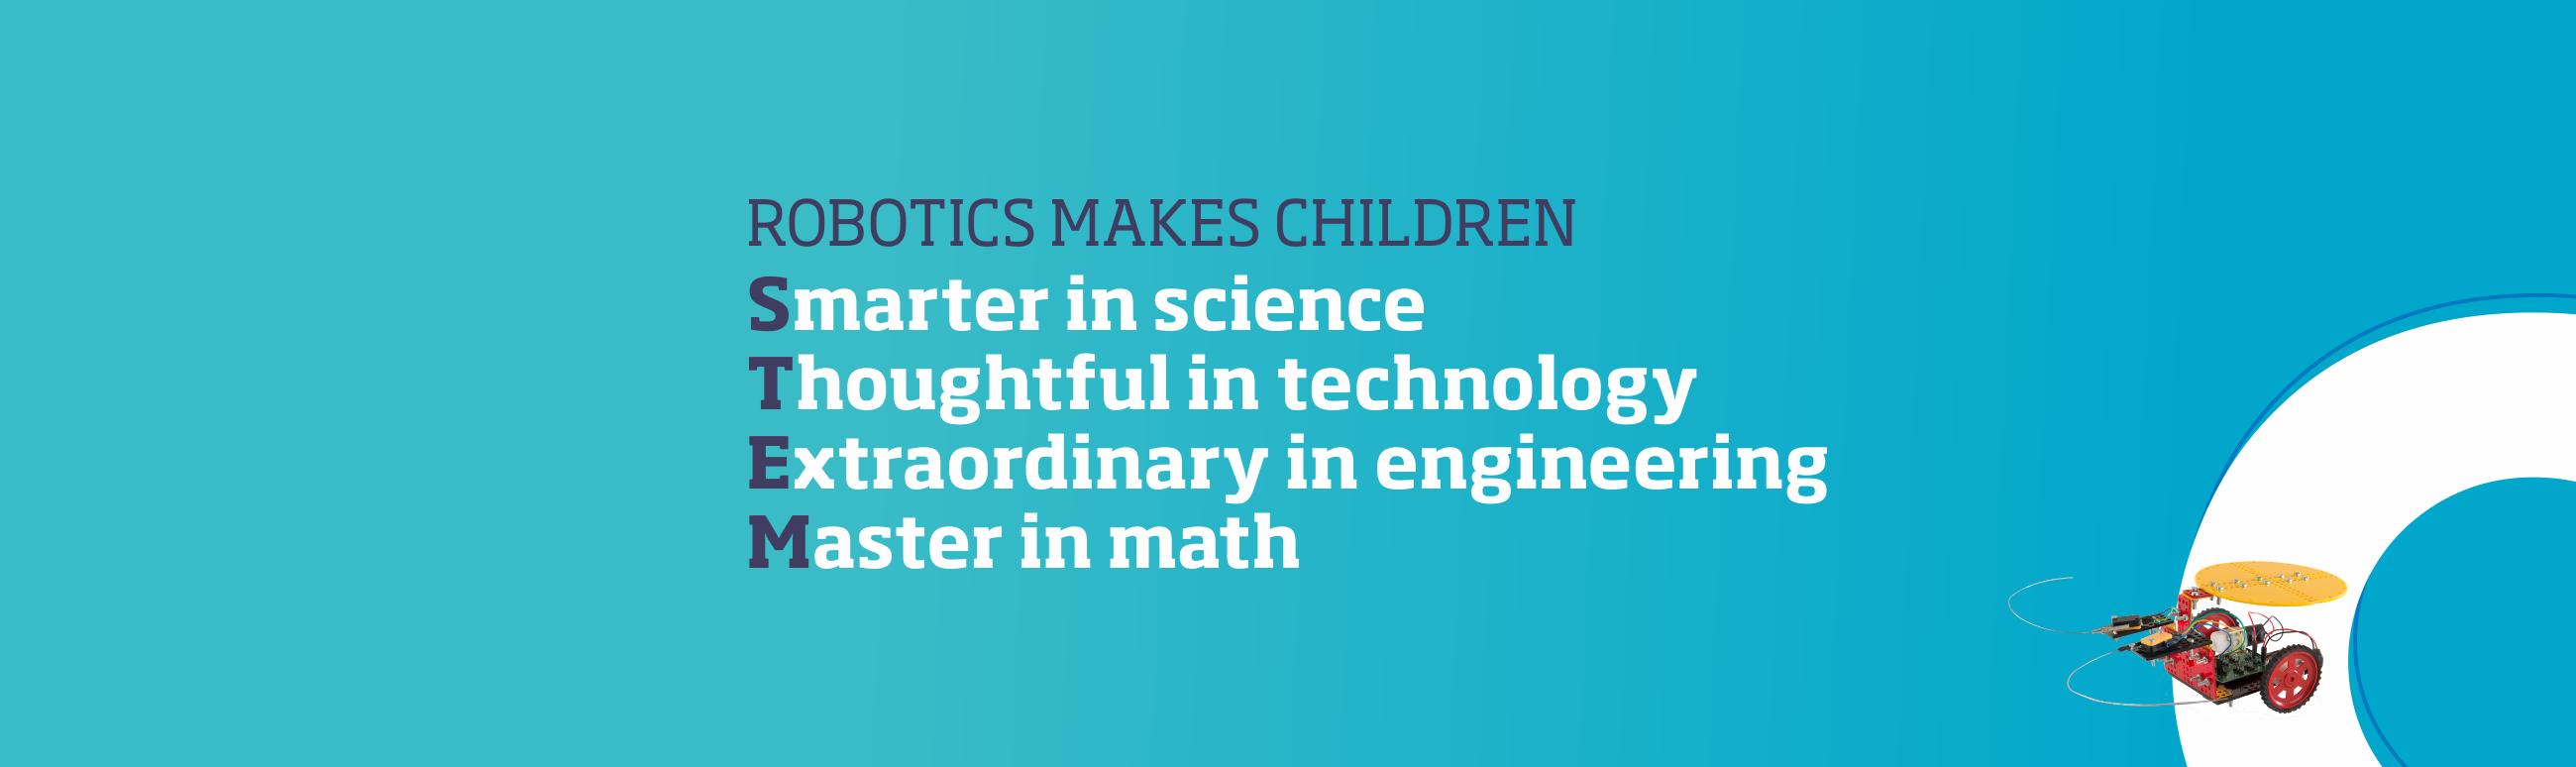 STEM for kids has become critical in education. O'Botz STEM Robotics prepare children for tomorrow.